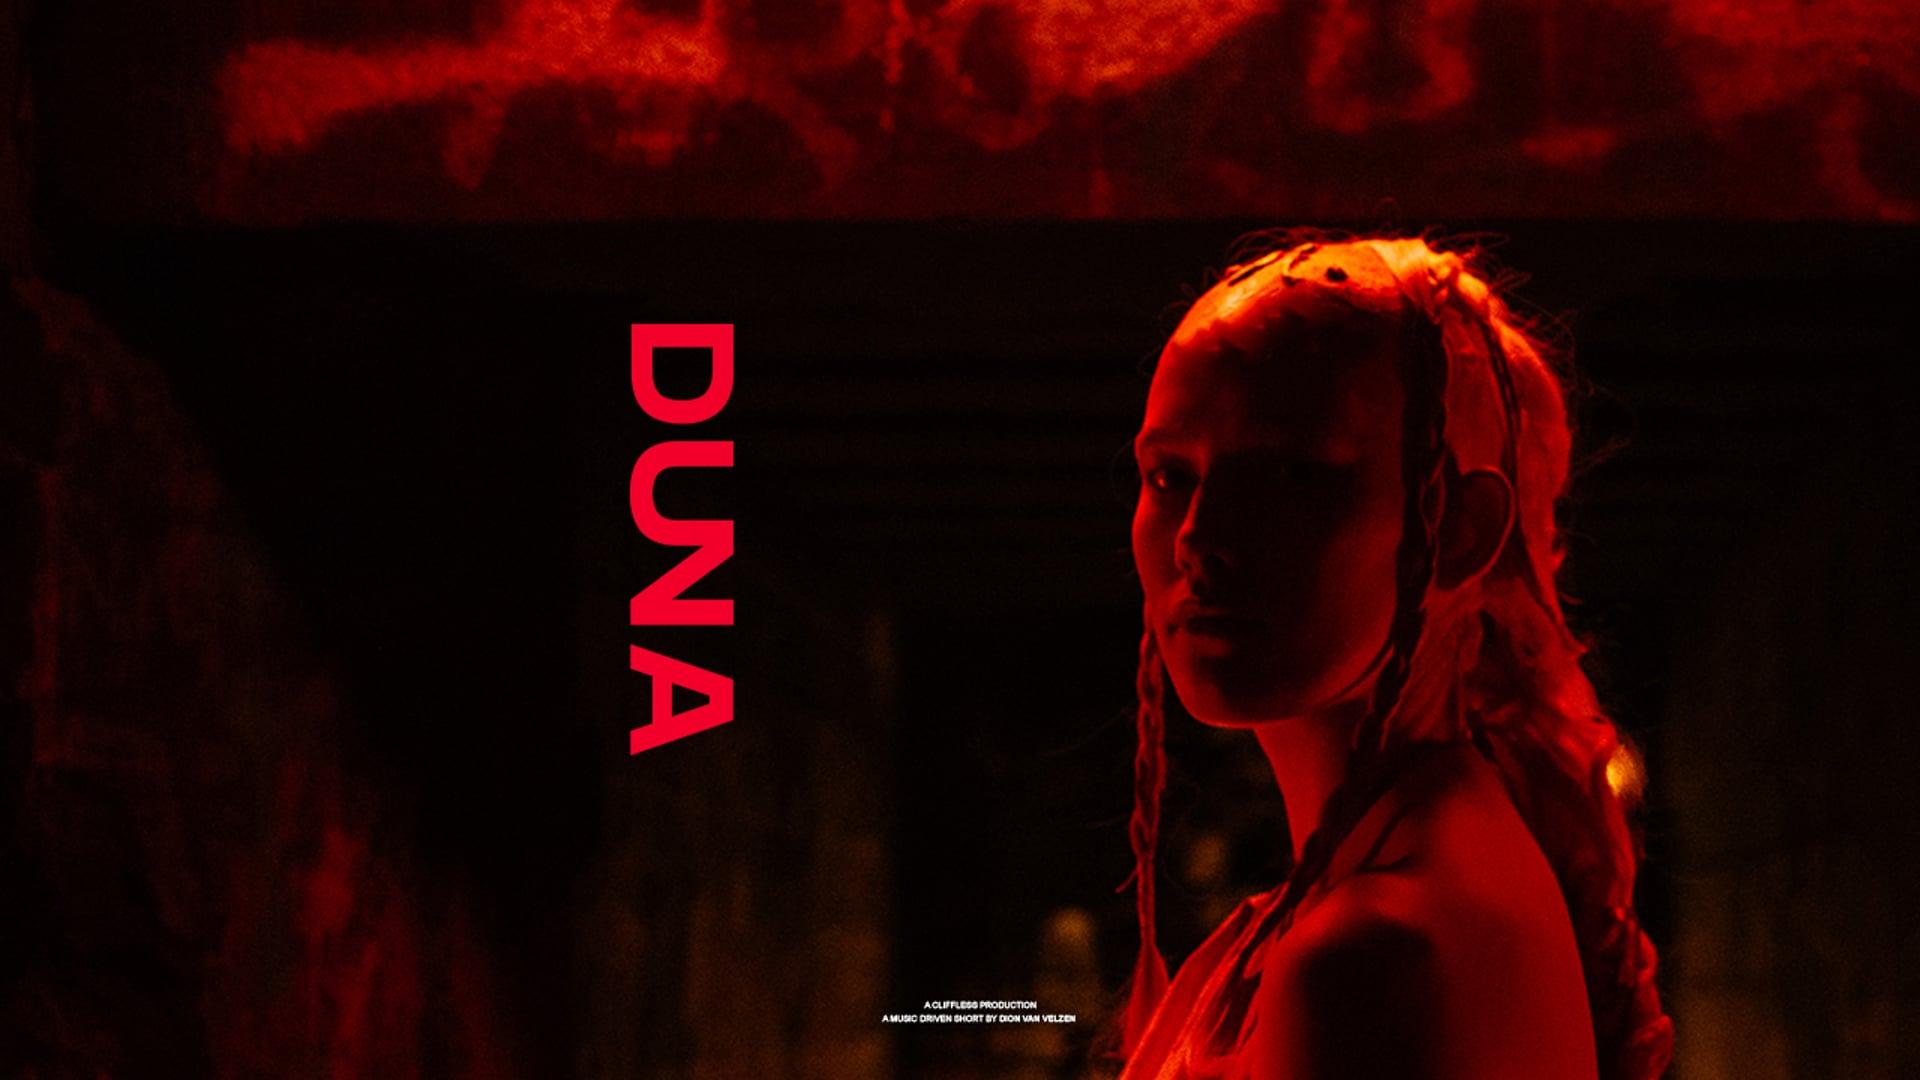 Cubiqle - Duna (Music Driven Short Film)